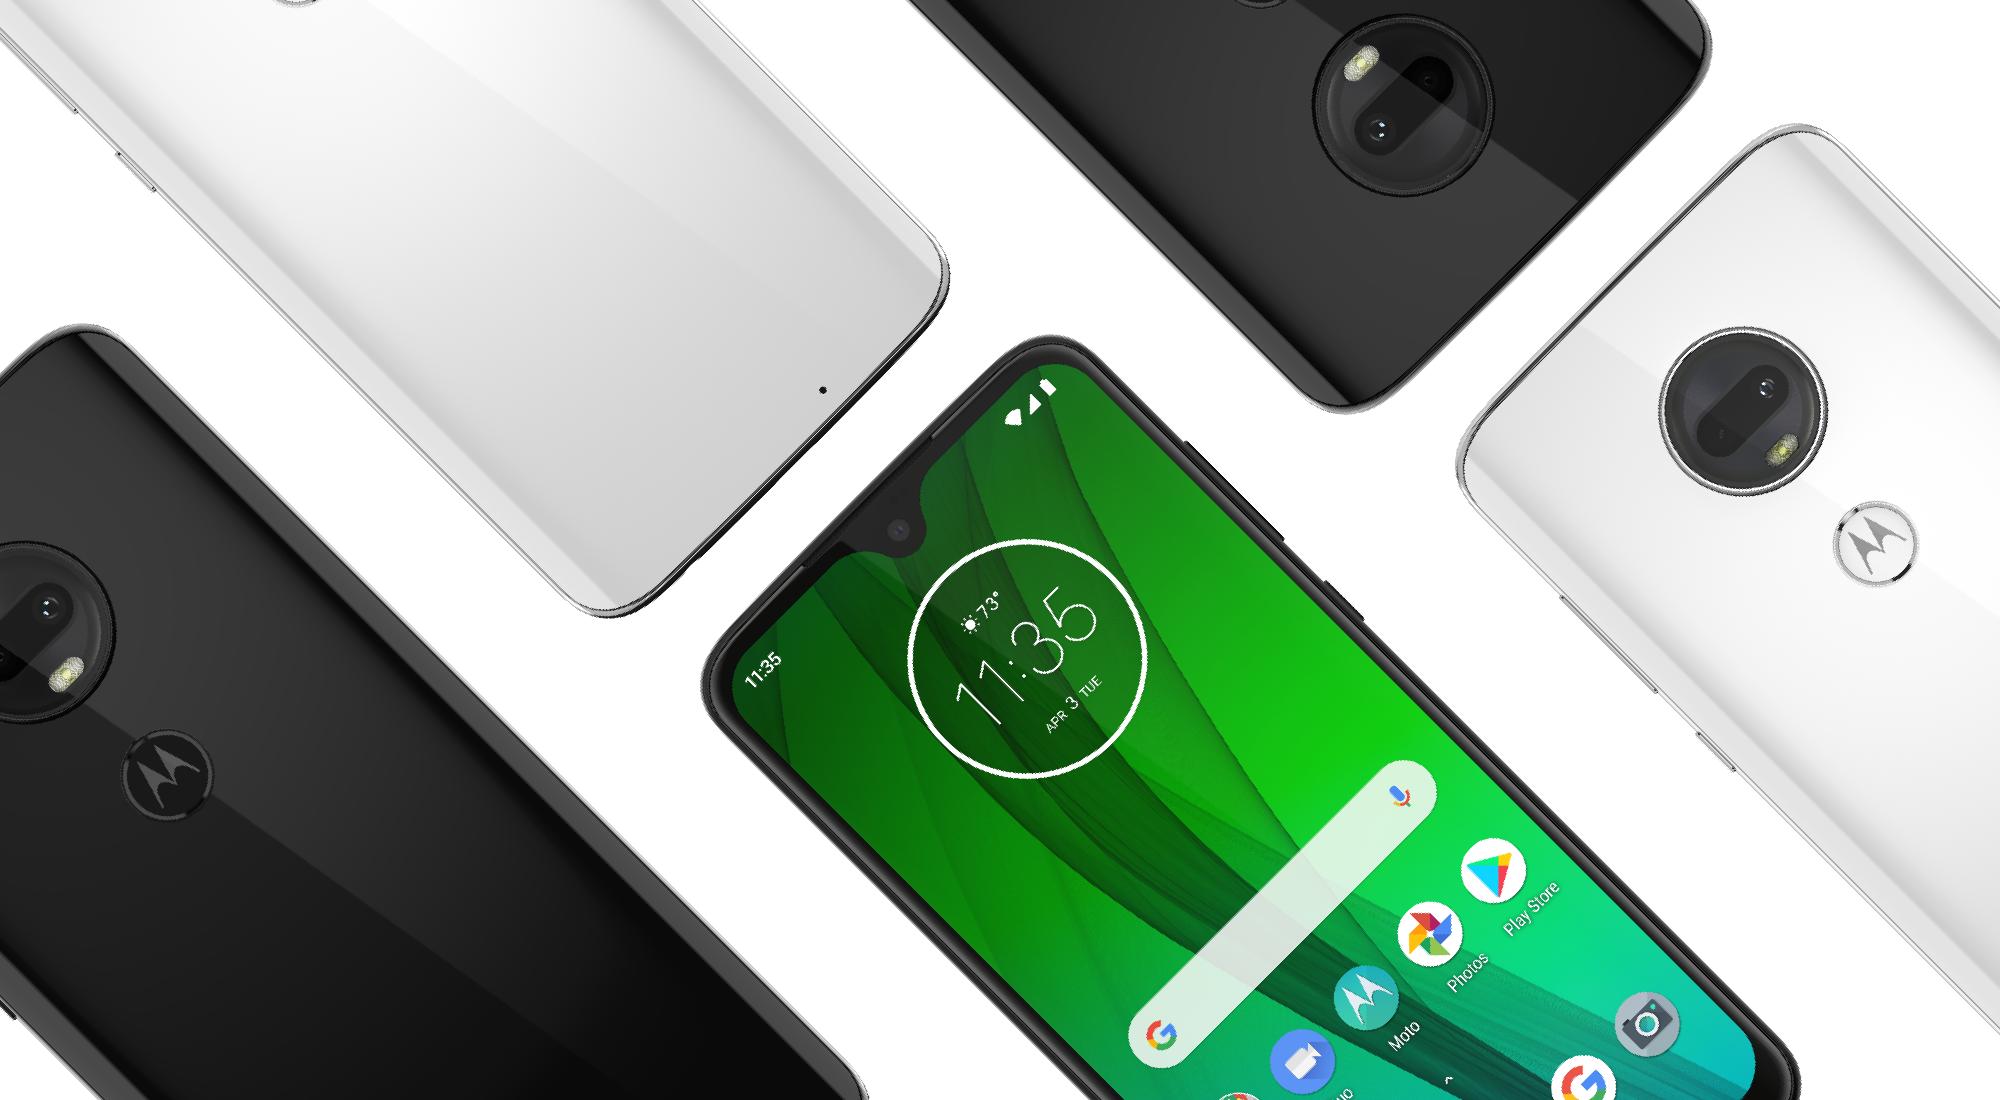 Google Fi welcomes a new phone from Motorola